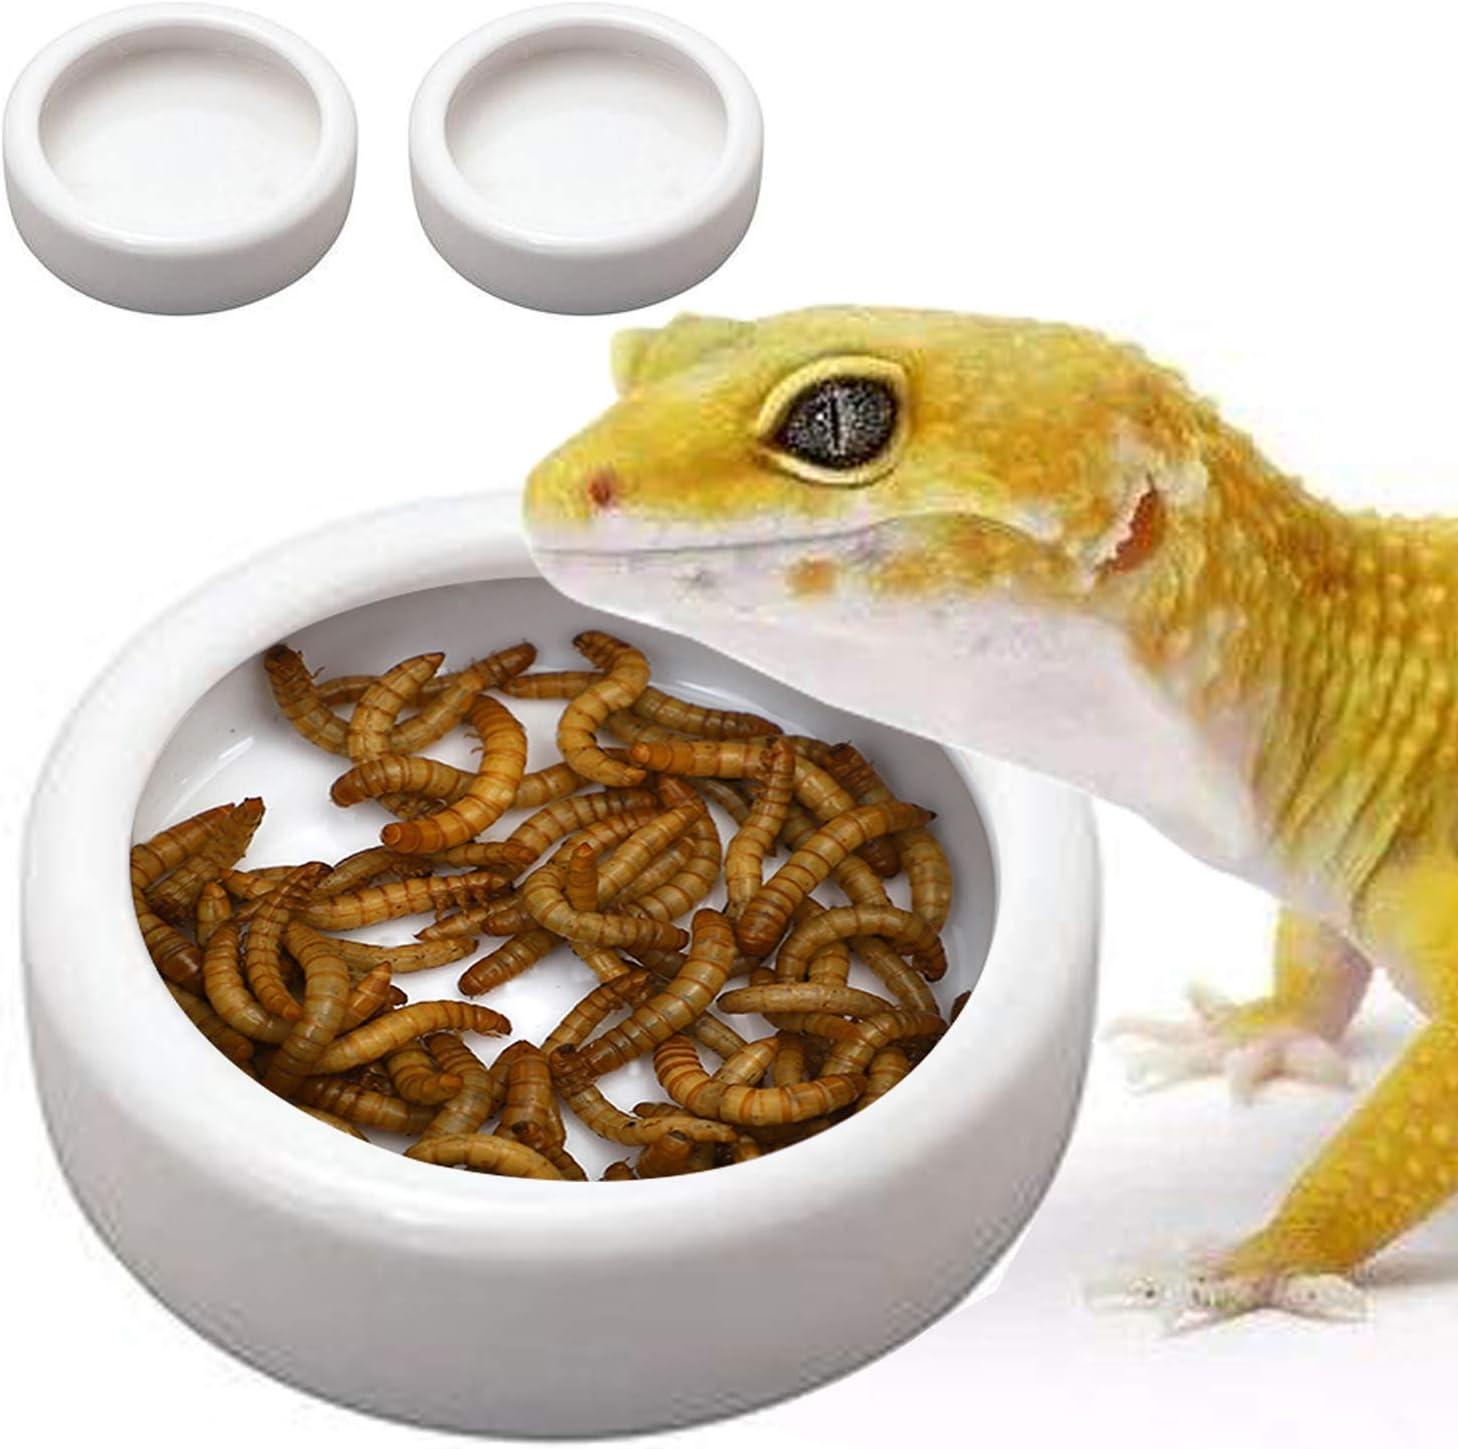 TDPET 2Pack Ceramic Mini Reptile Worm Dish - Lizard Escape Proof Feeding Bowl Circular (2Pack S, White)